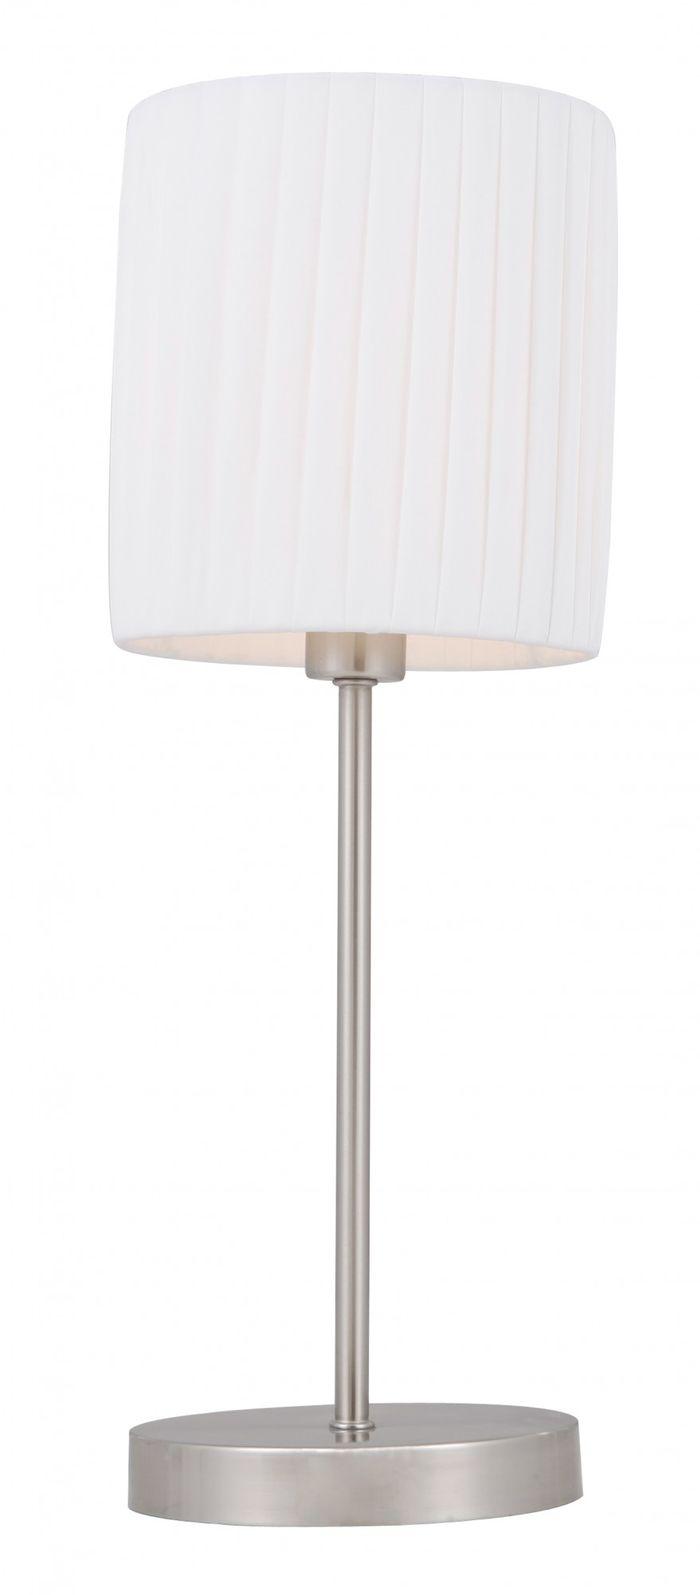 Tischlampe LA NUBE, nickel matt, Plissee weiss, Globo 15105T